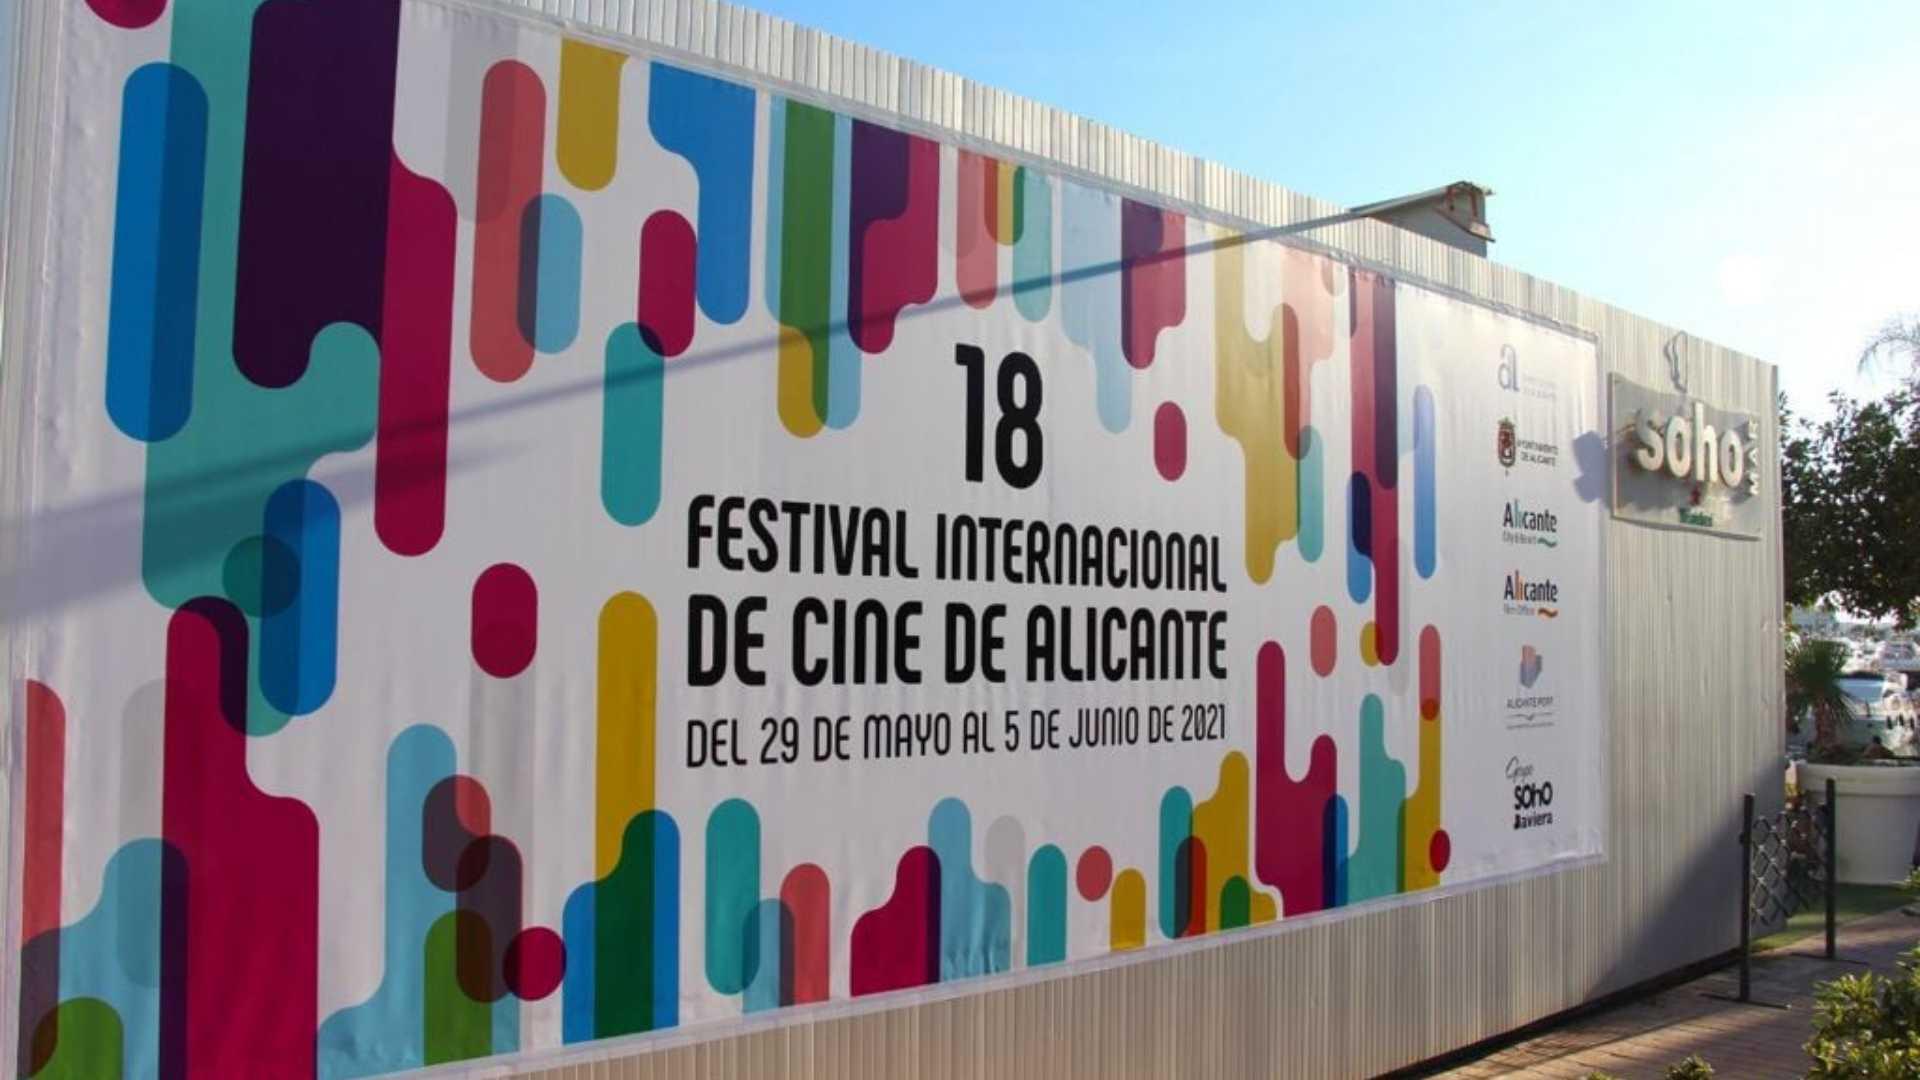 festival de cine de alicante 2021